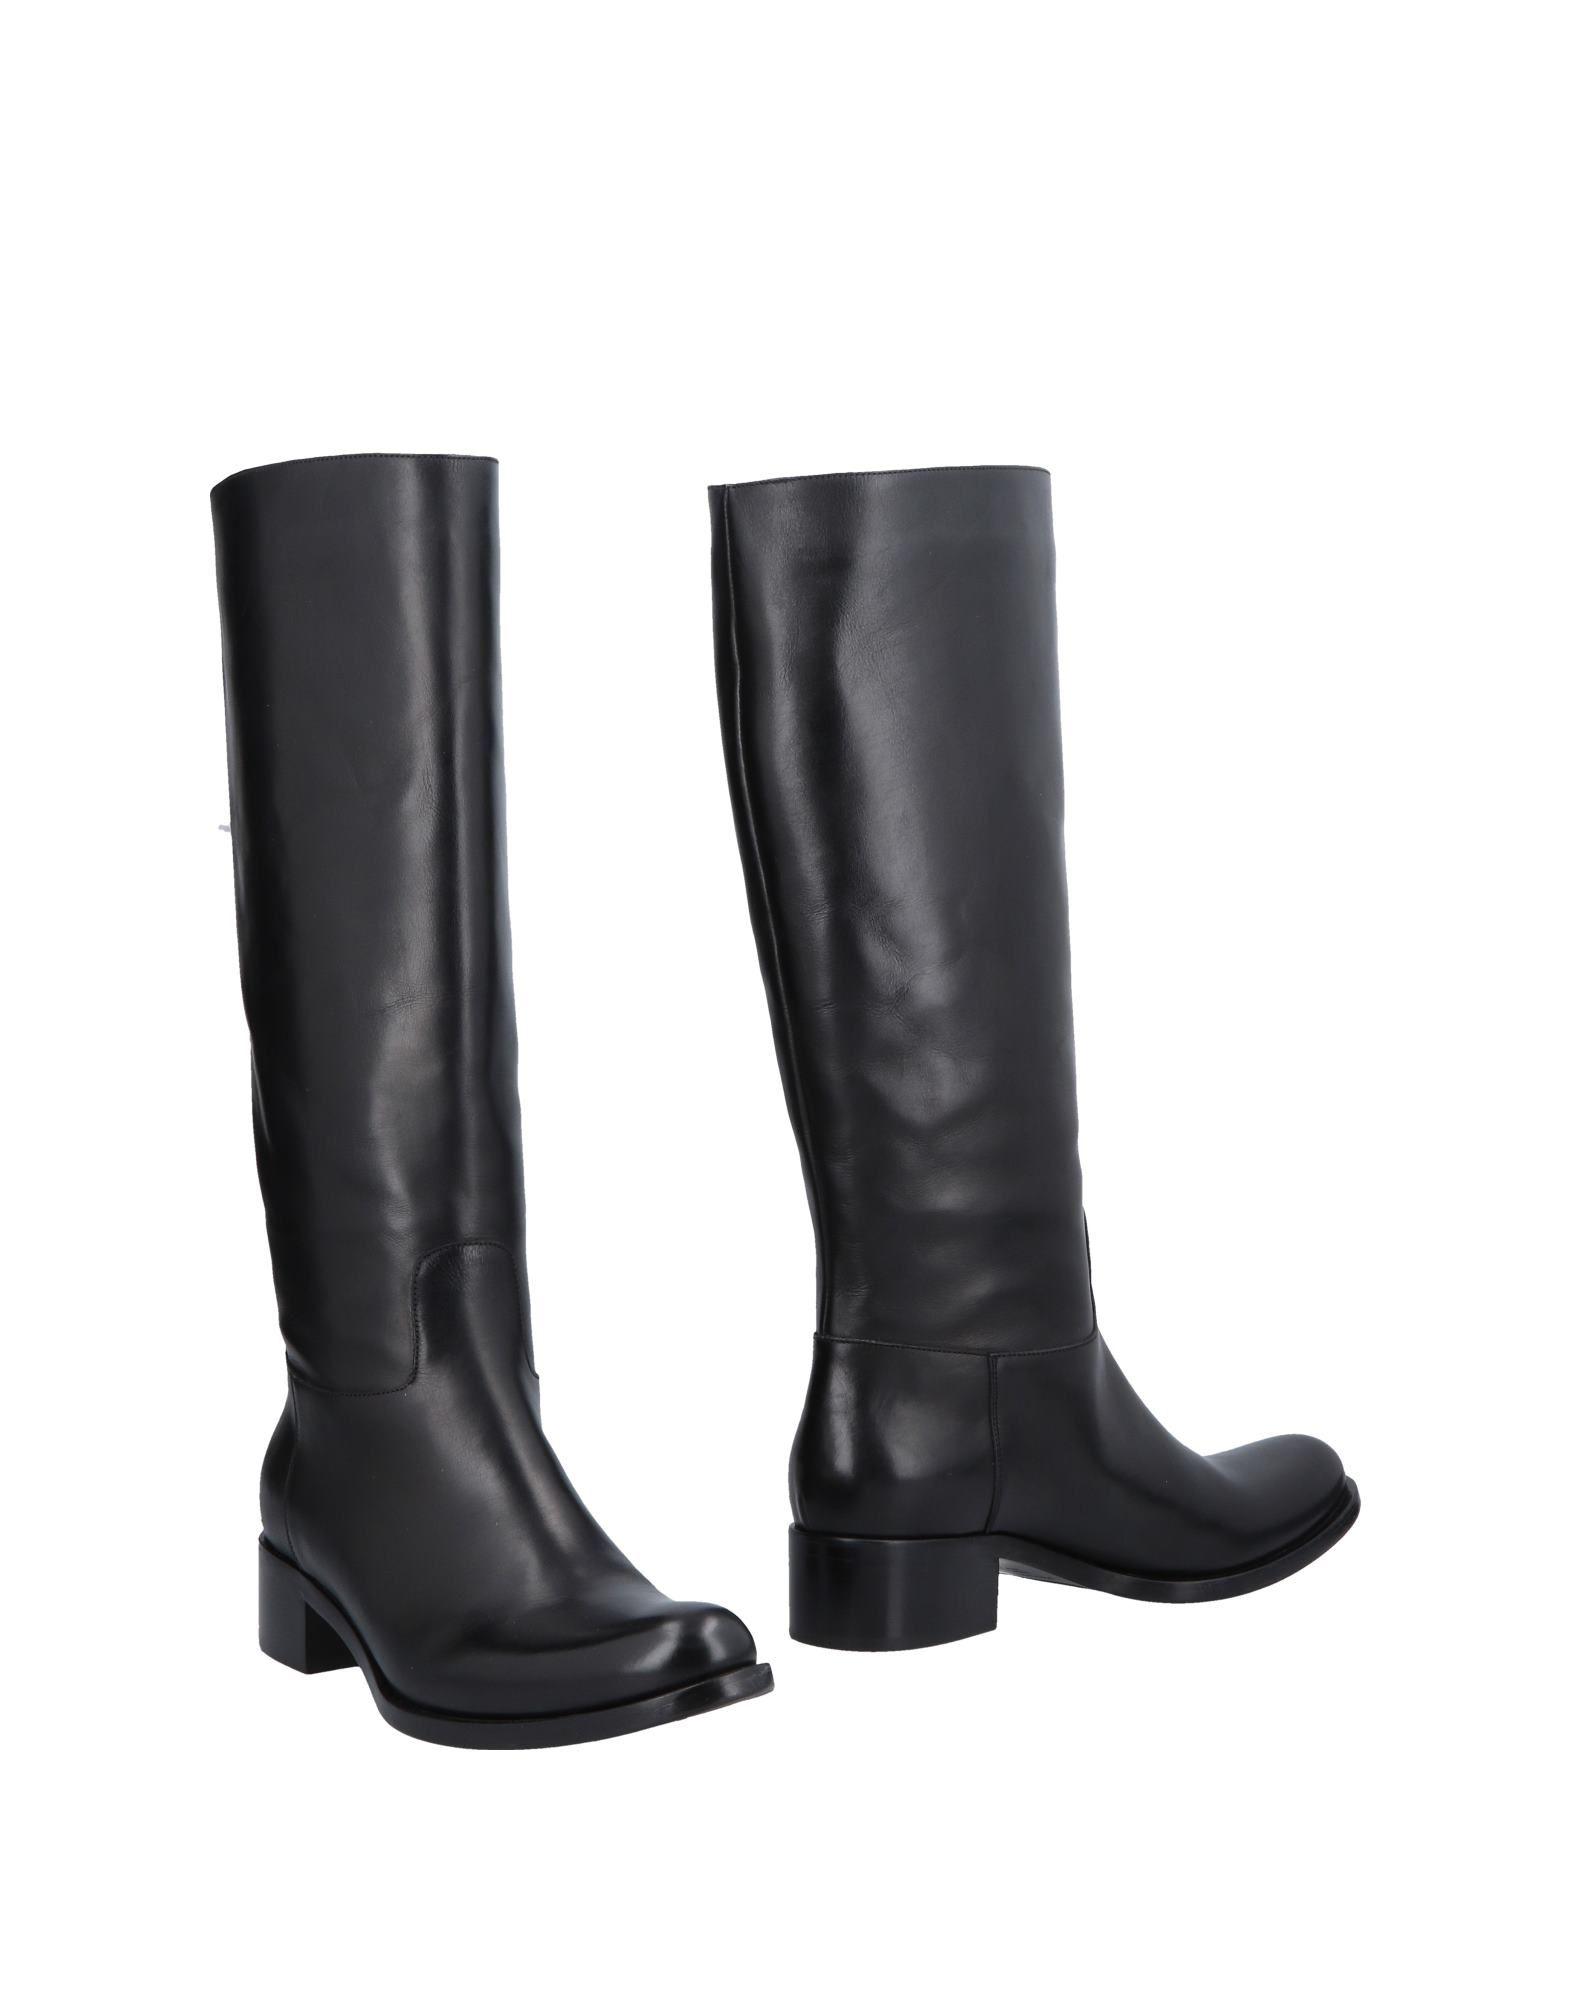 VITTORIO VIRGILI | VITTORIO VIRGILI Boots | Goxip